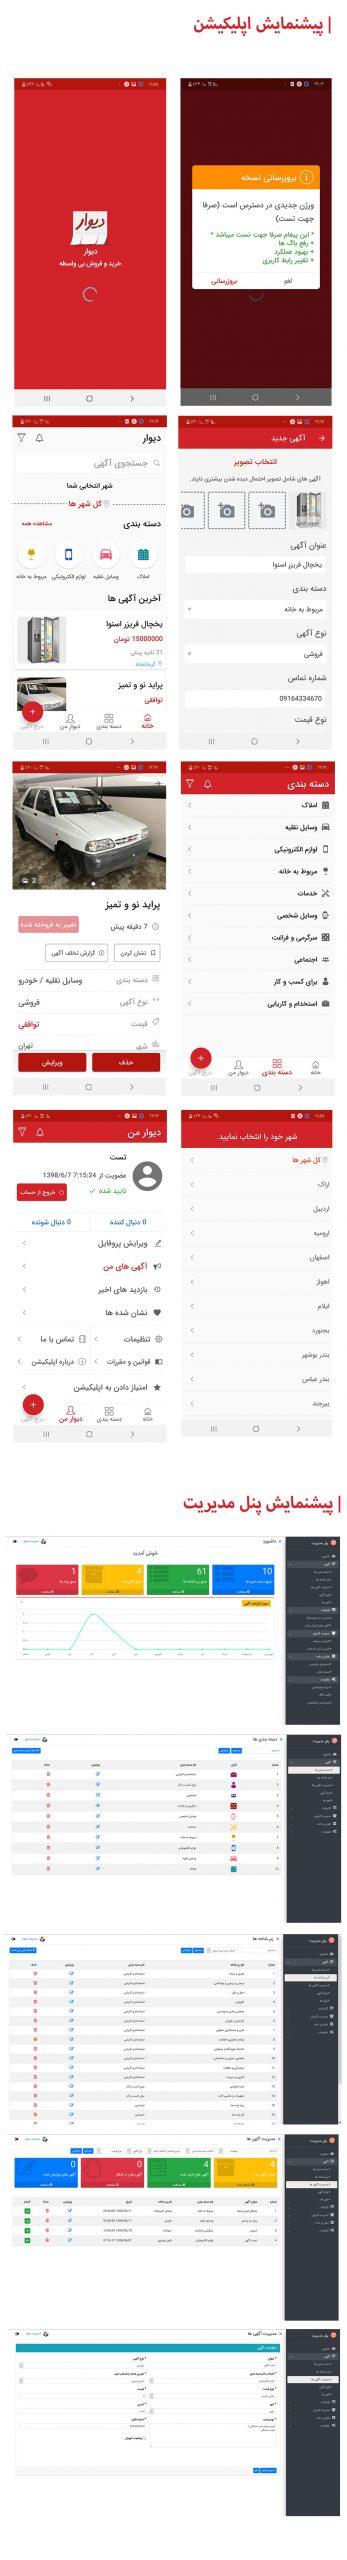 bannar full divar scaled - سورس اپلیکیشن دیوار به همراه پنل مدیریت